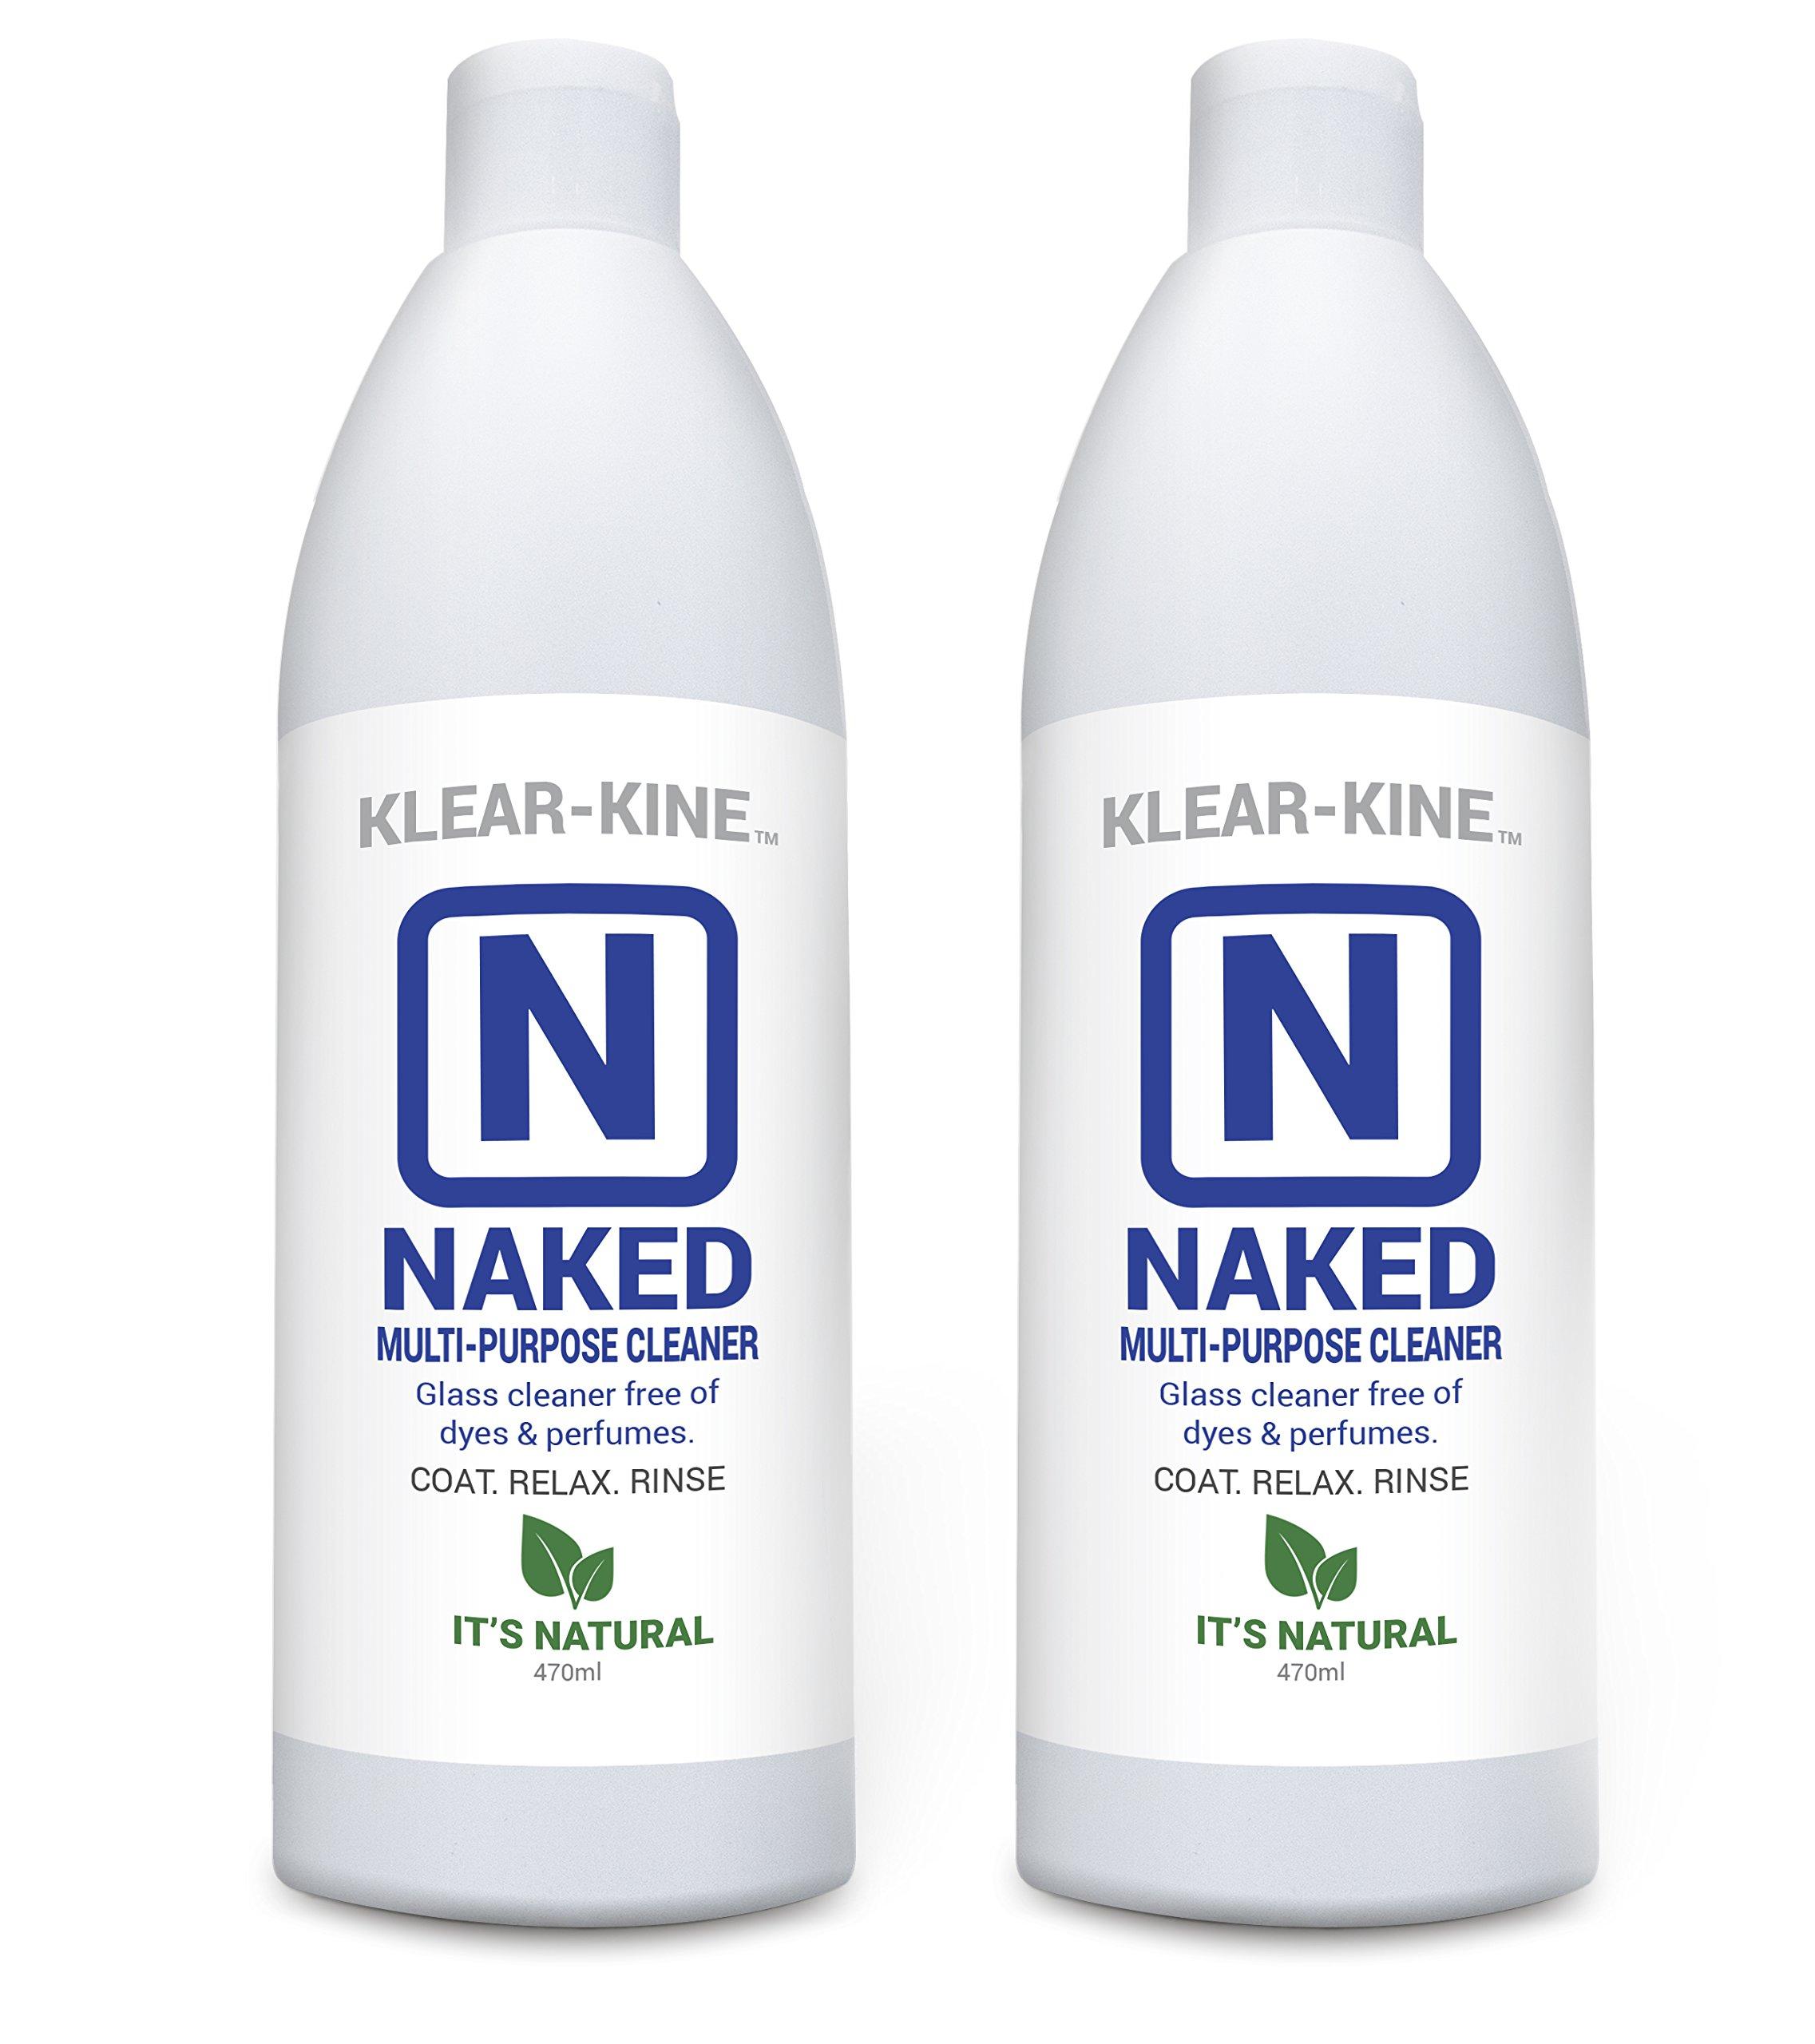 KLEAR-KINE Naked Glass Cleaner | Clay Based Formula | 420 & 710 Remover | 470ml Bottle | 2 Pack